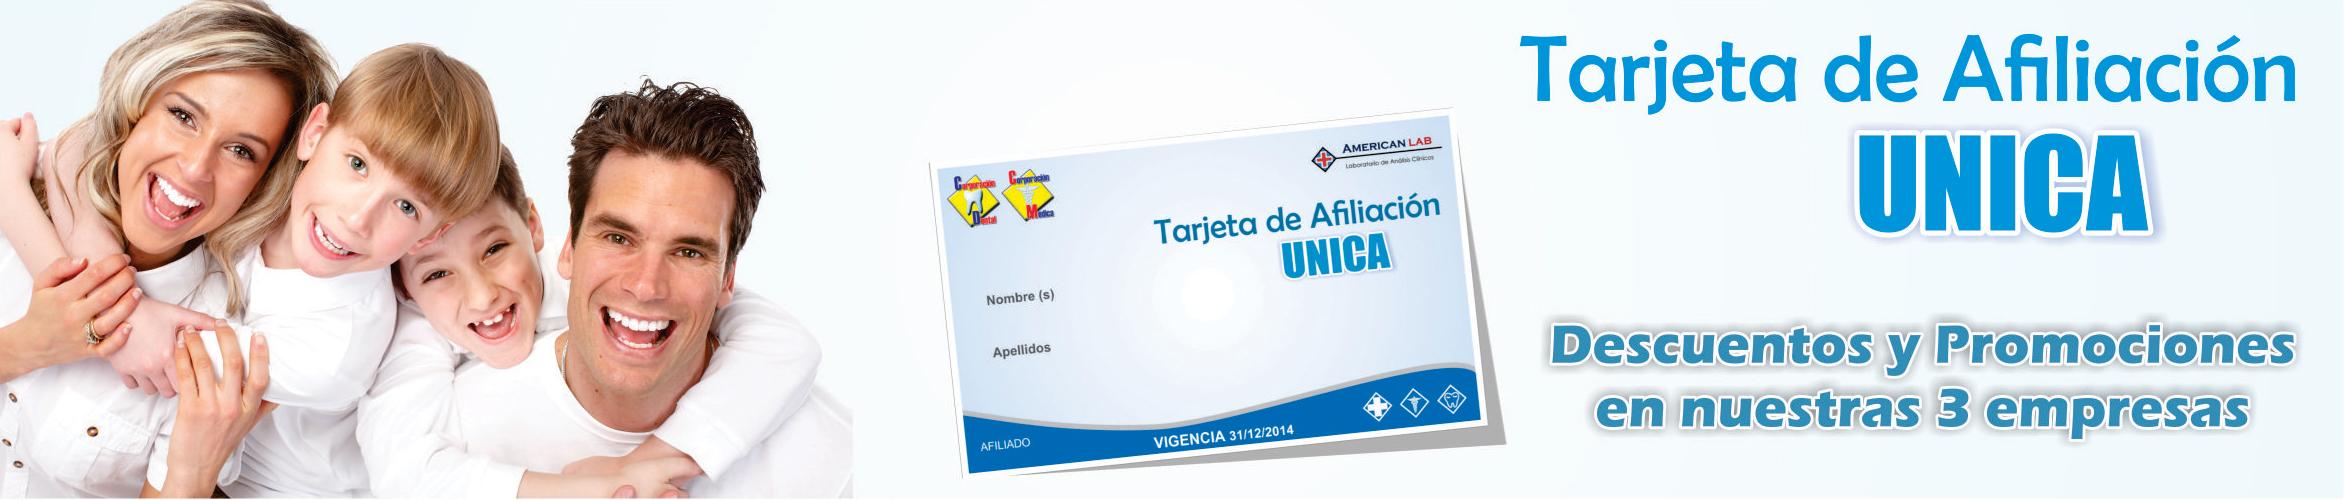 tarjeta-unica